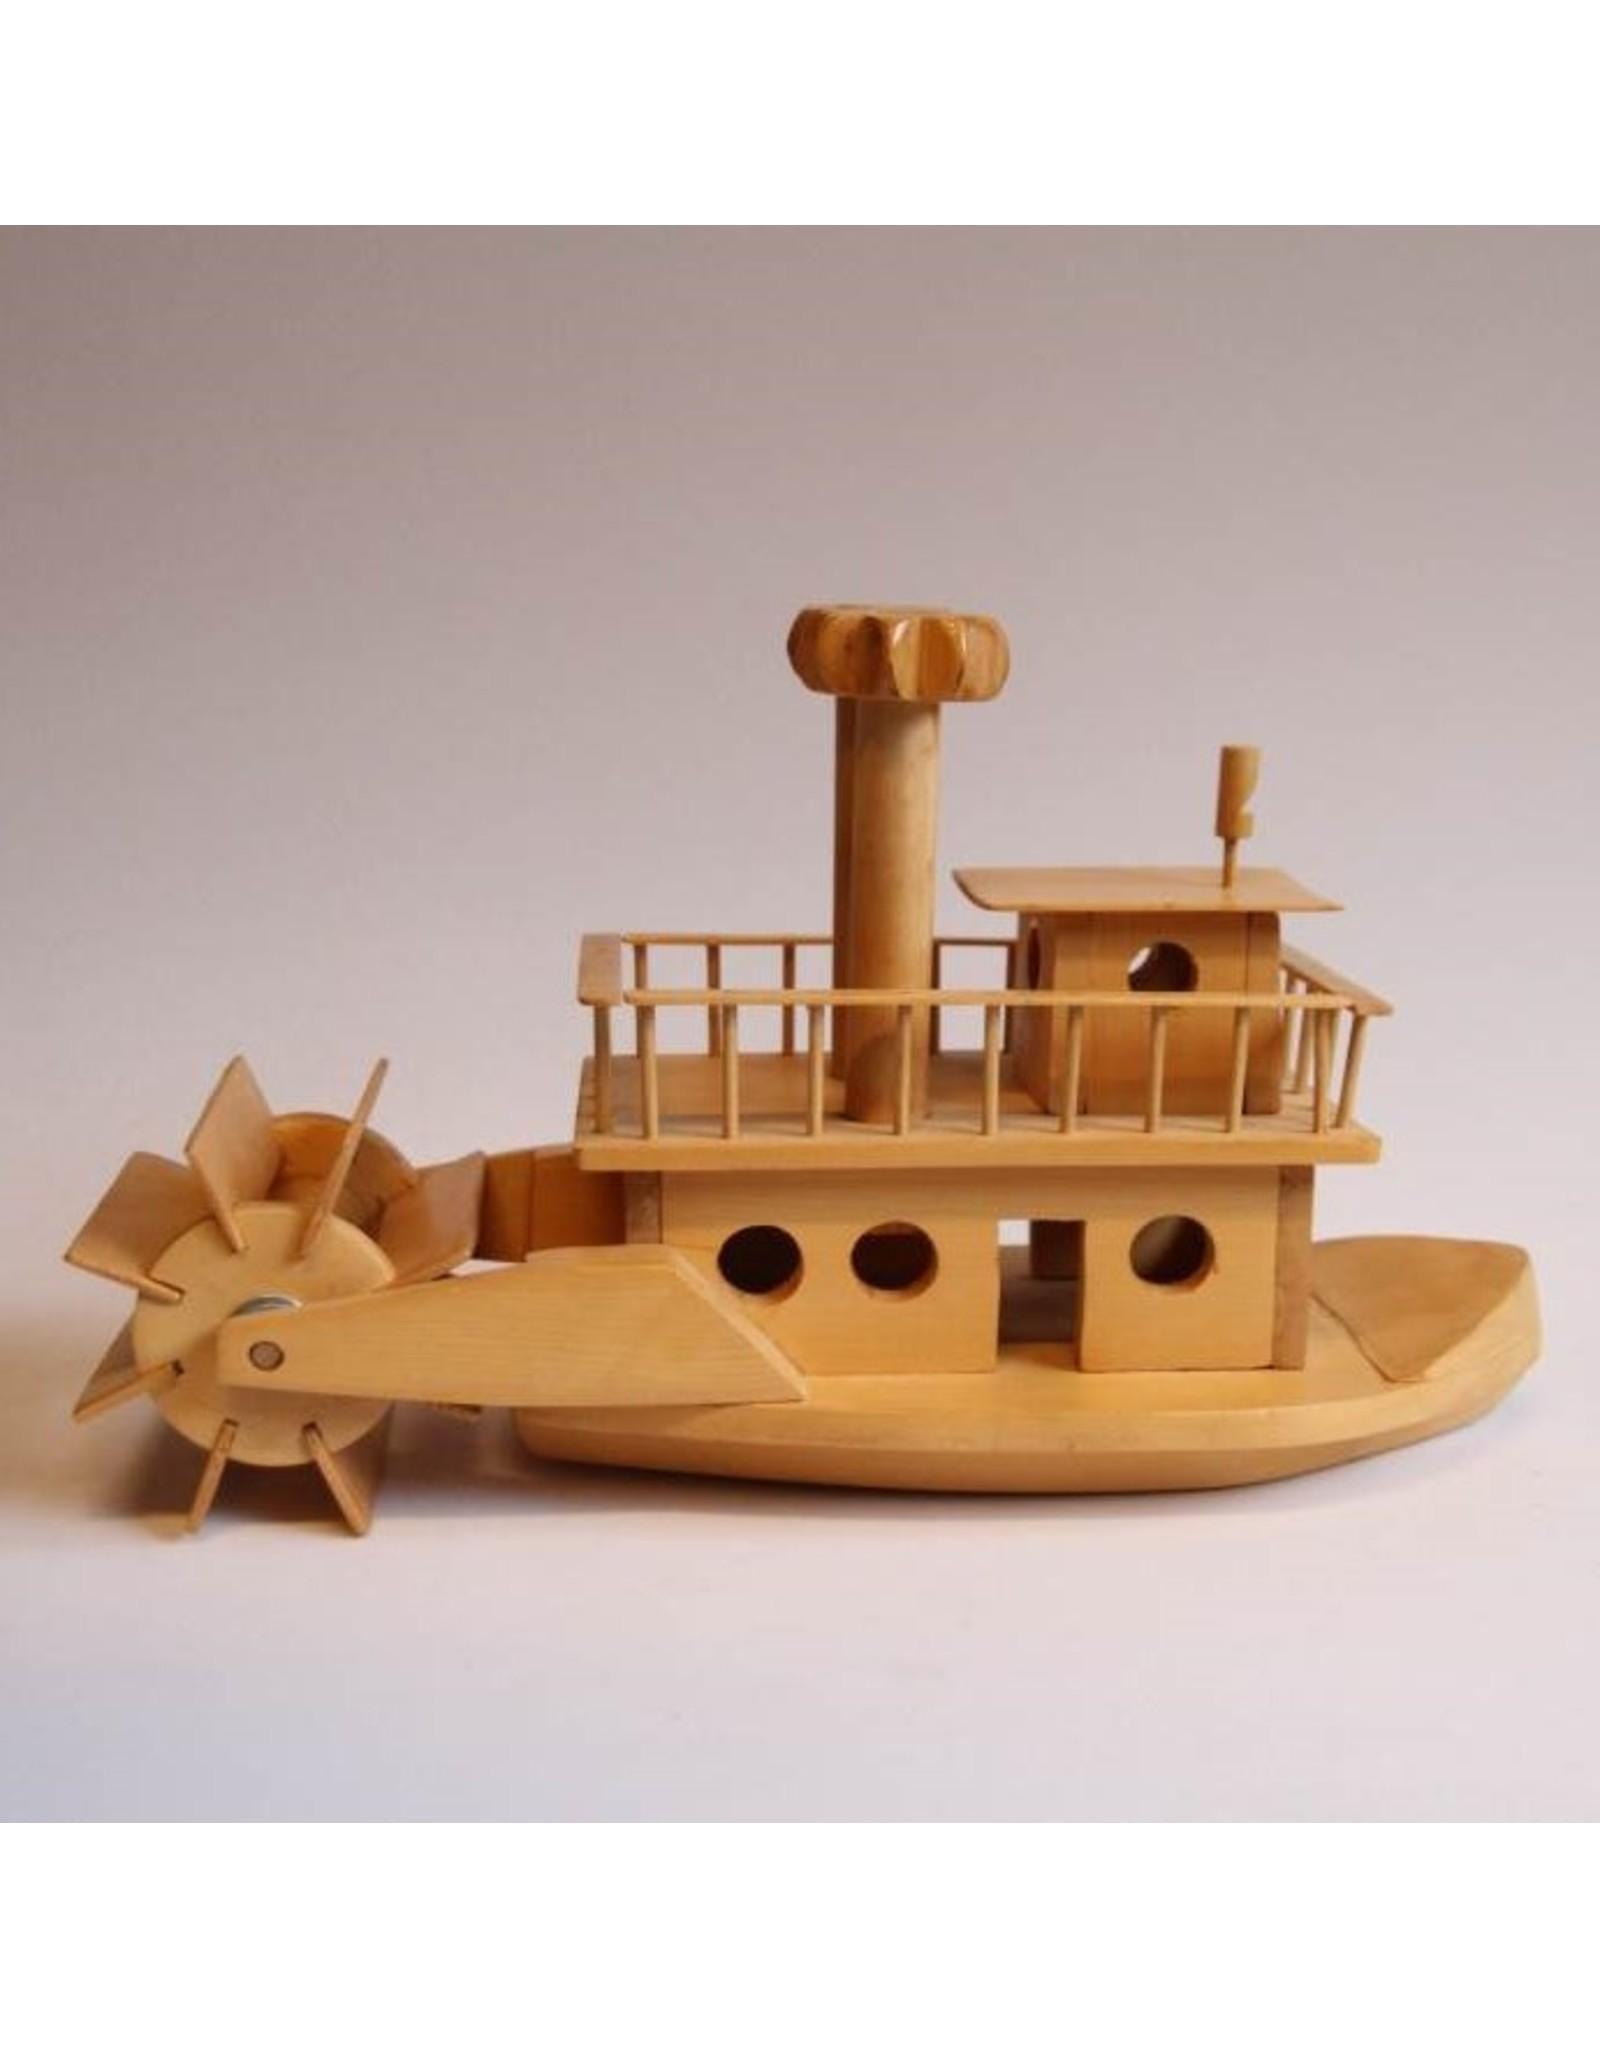 Paddle wheeler - folk art